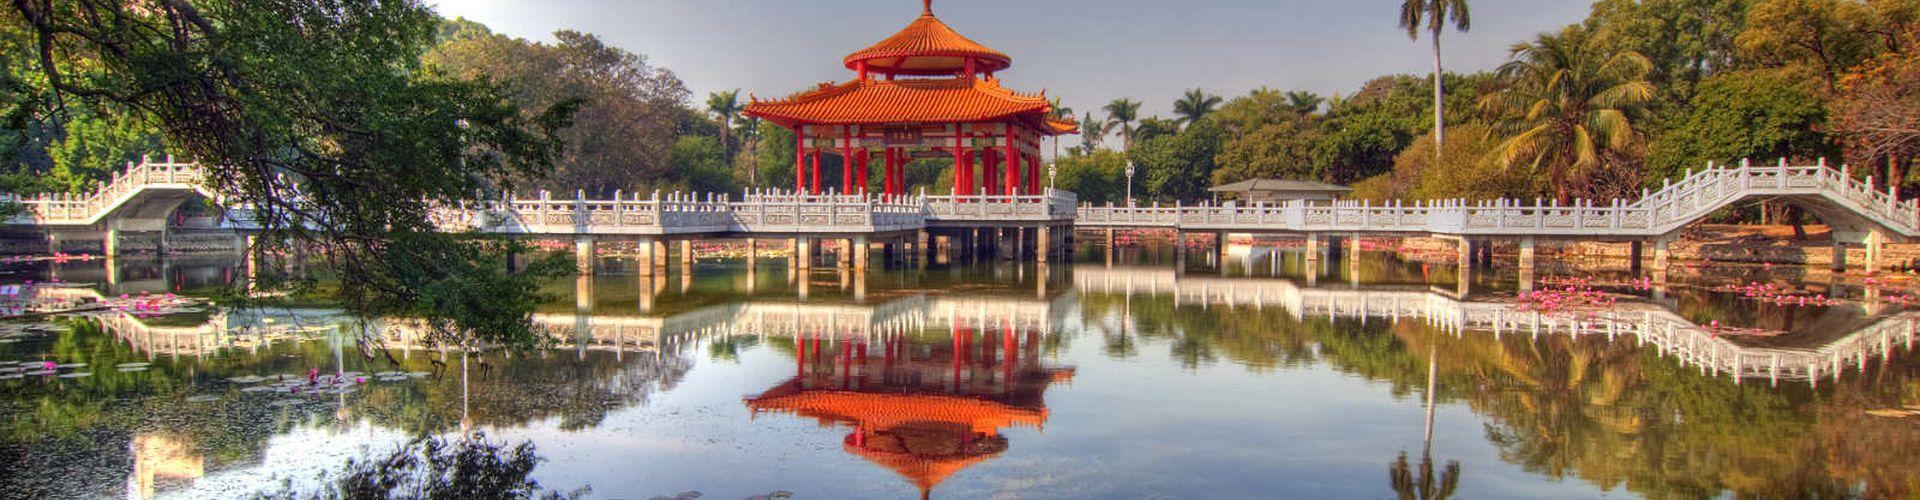 10 amazing bike routes in Taiwan